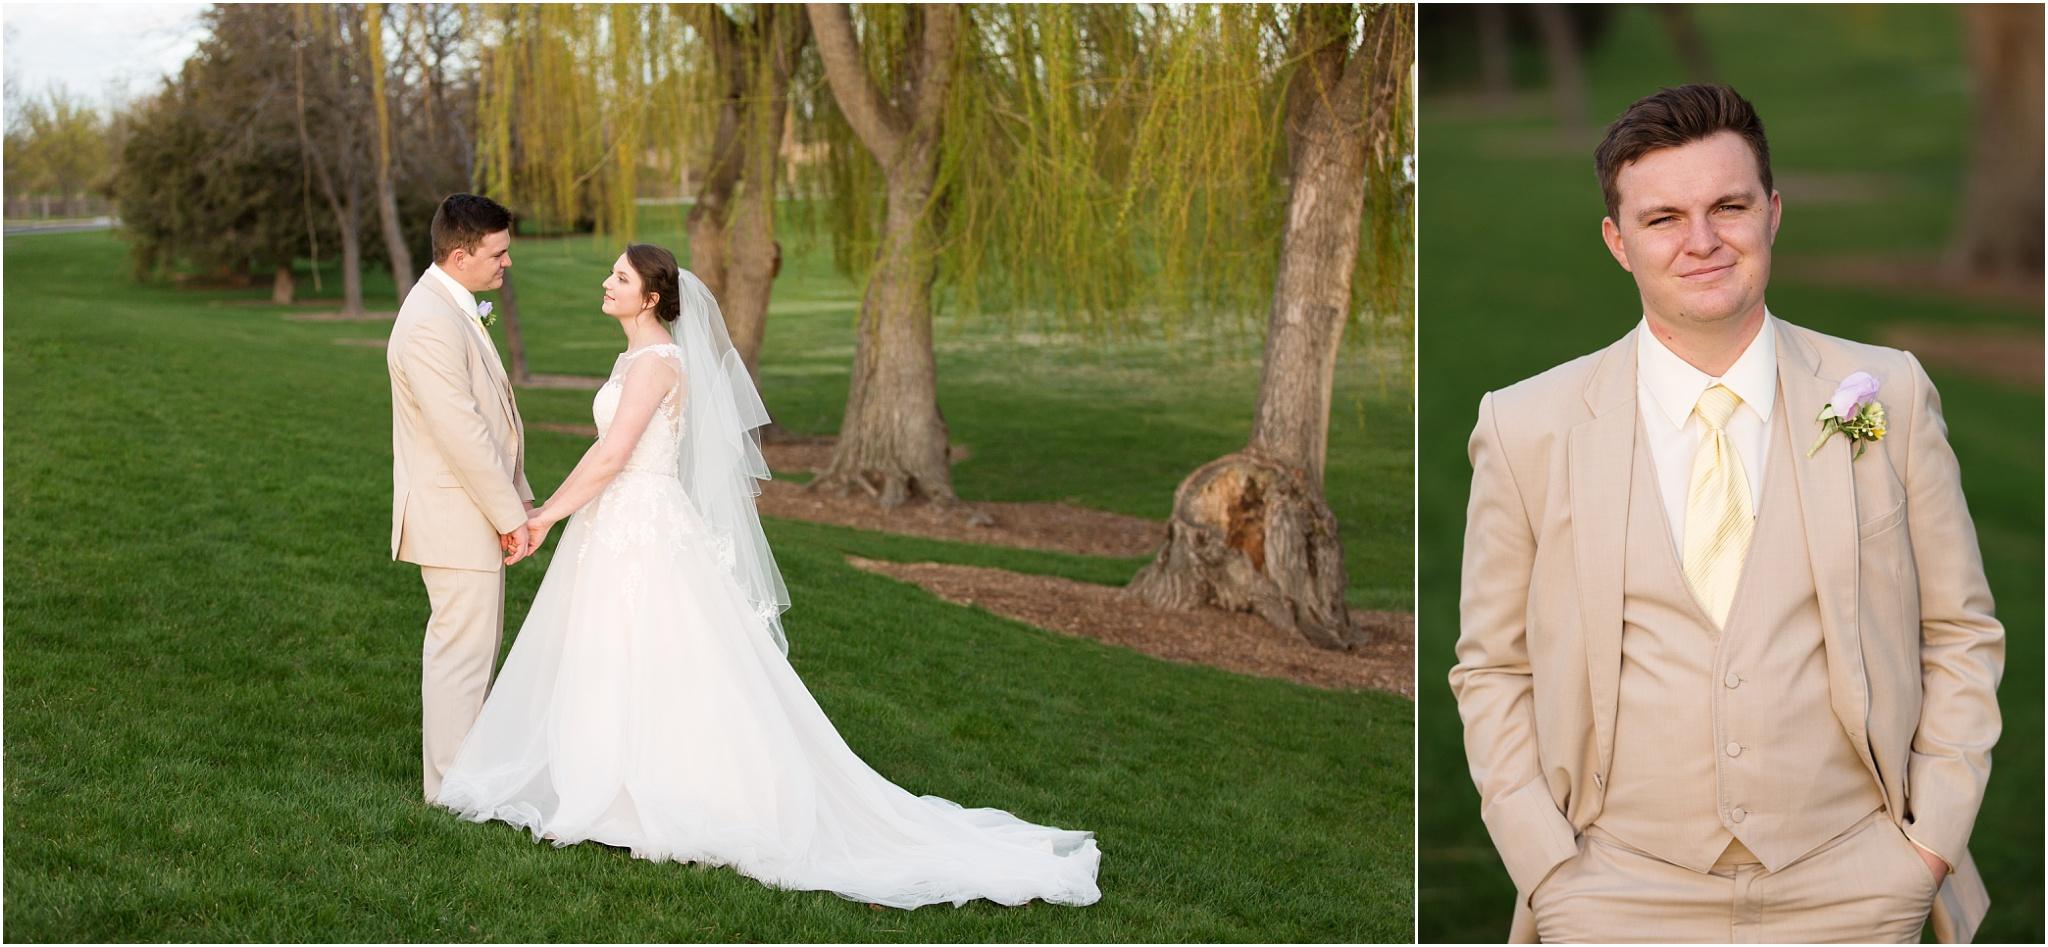 Wedding Photography_Meridian Idaho_Nampa Idaho_Leah Southwick Photography_0078.jpg